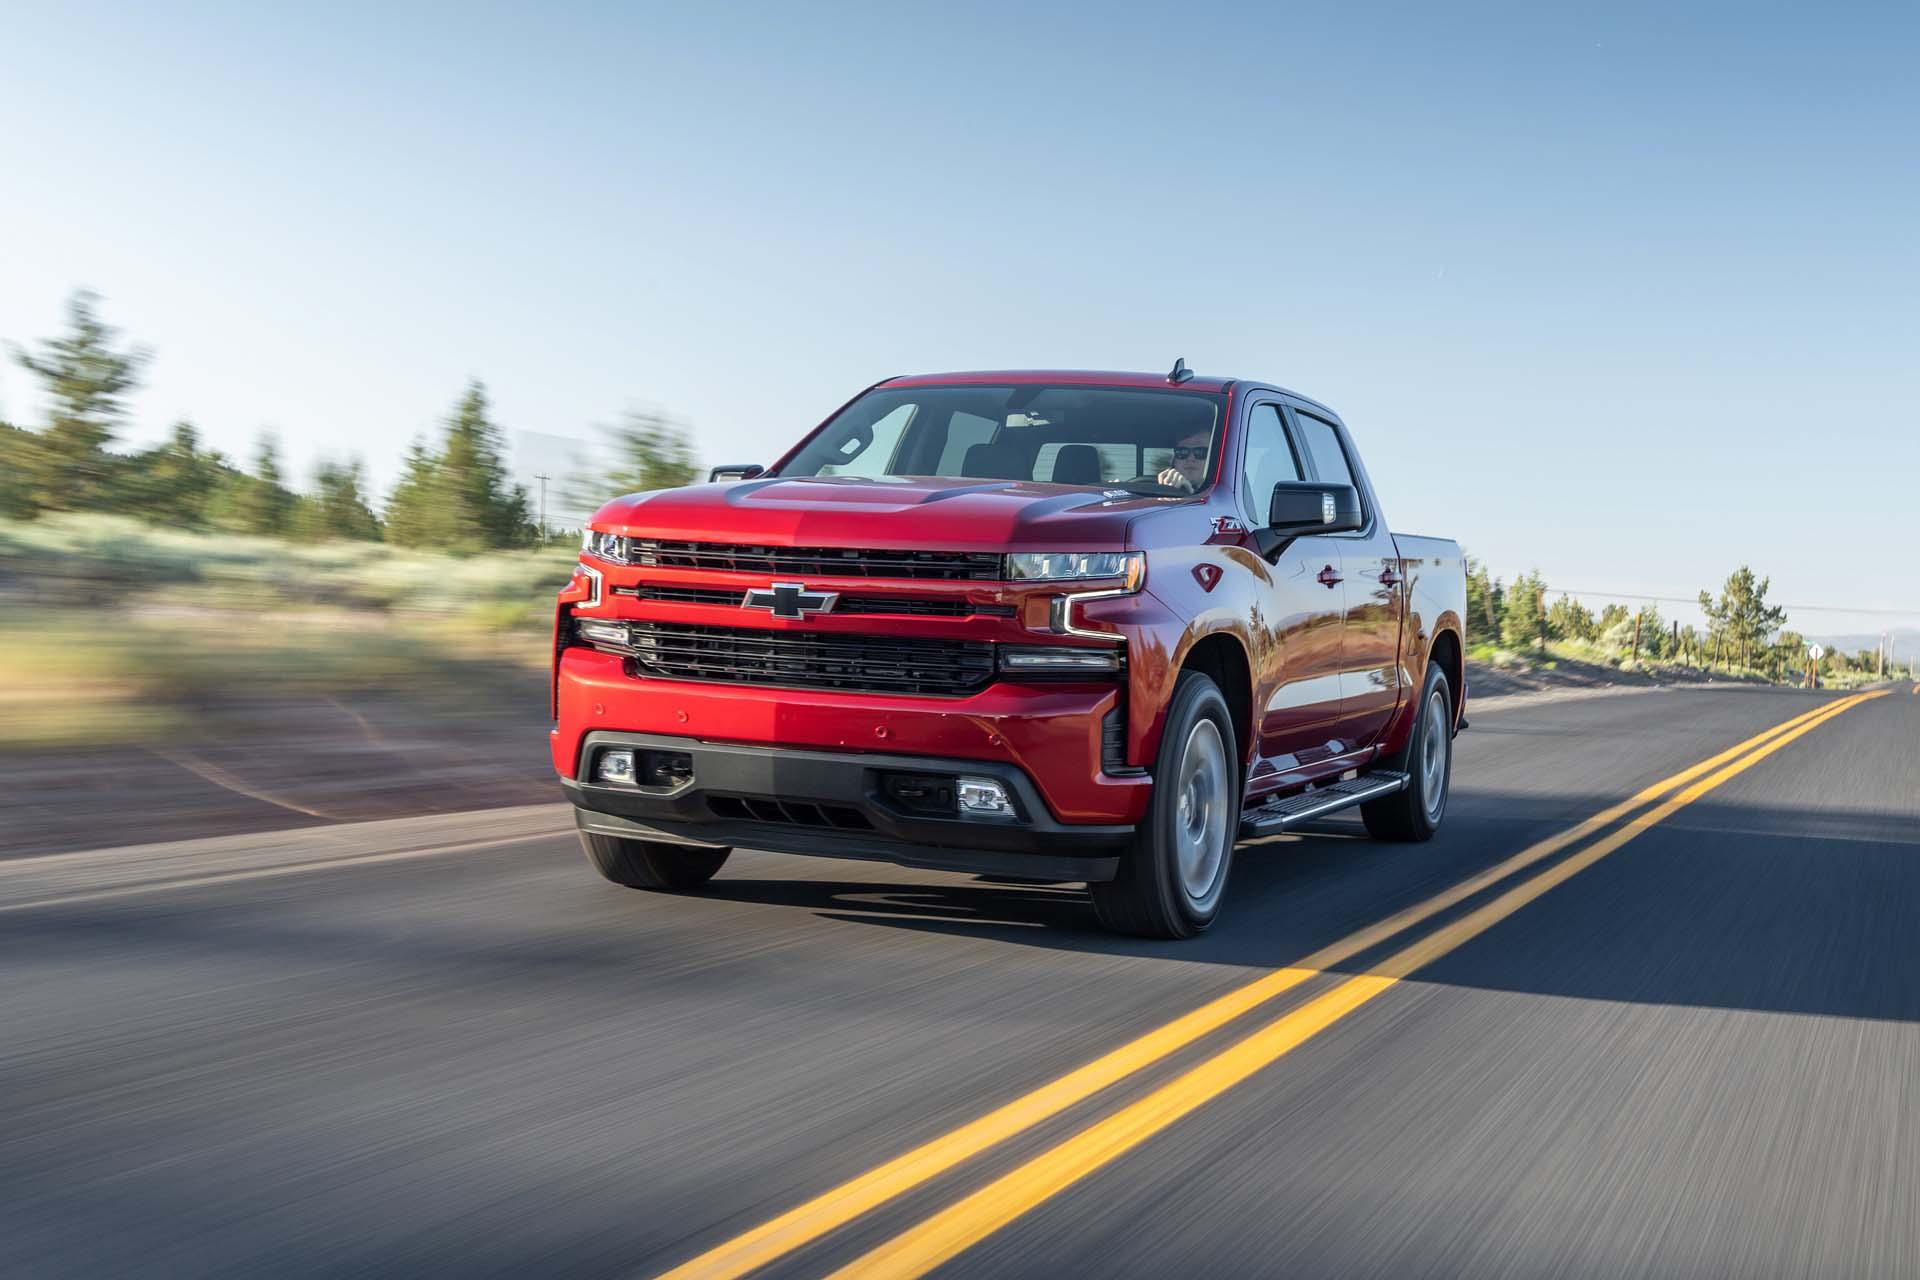 2020 Silverado 1500 Diesel Performance and New Engine